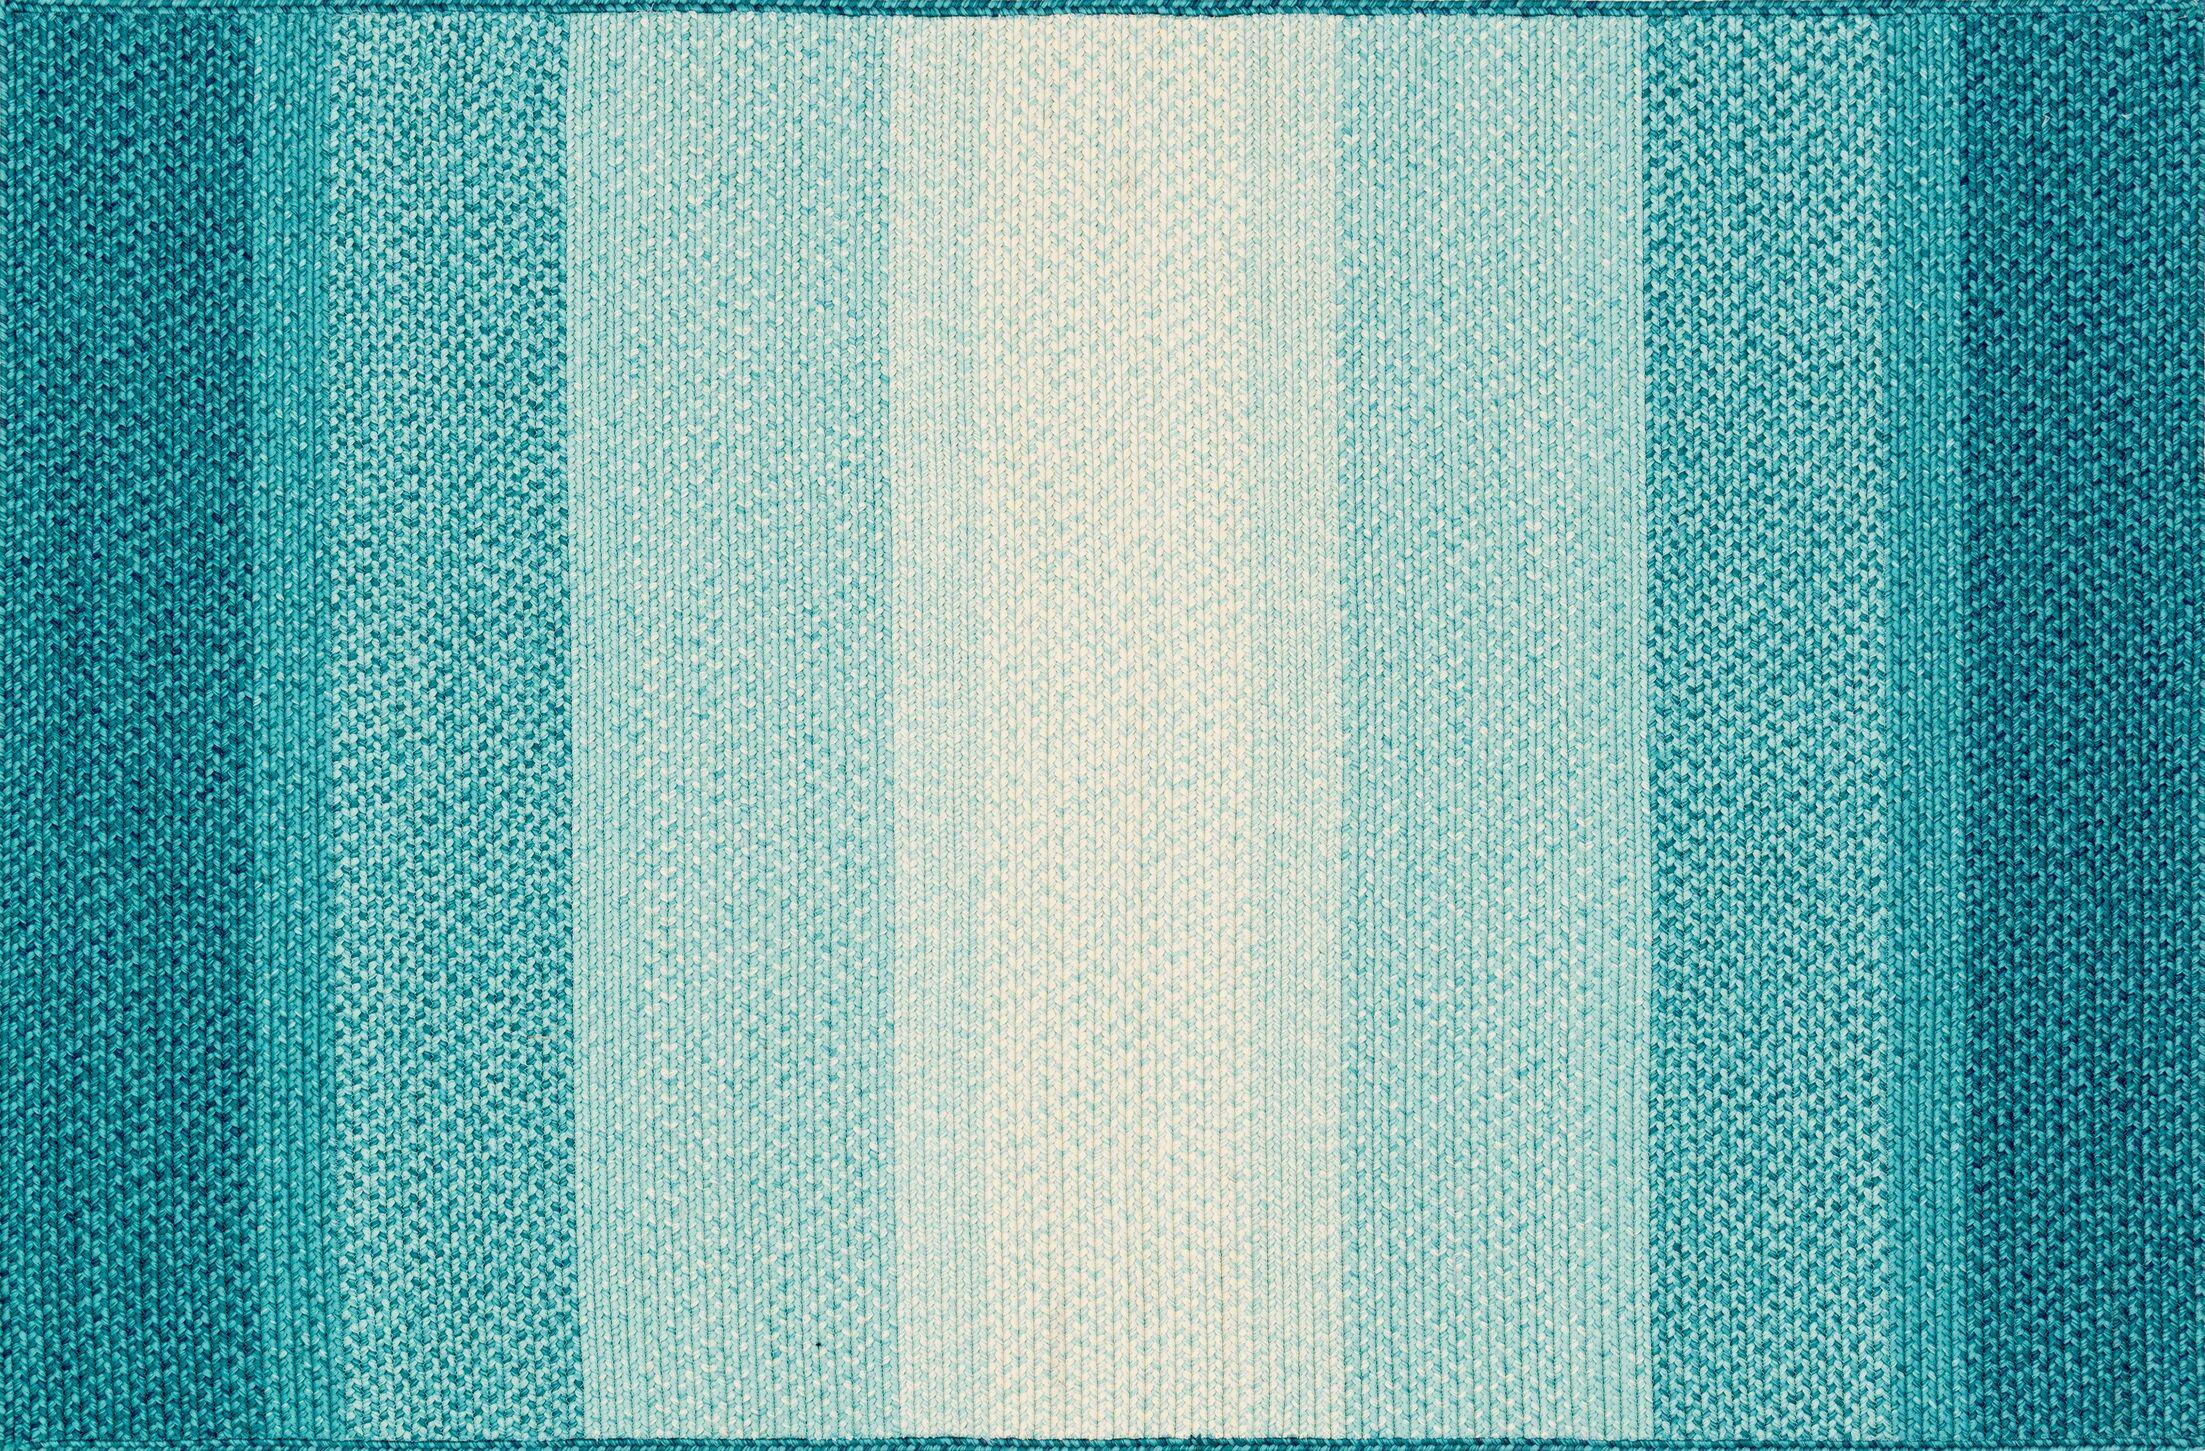 Barta Blue Indoor/Outdoor Area Rug Rug Size: Rectangle 3'6